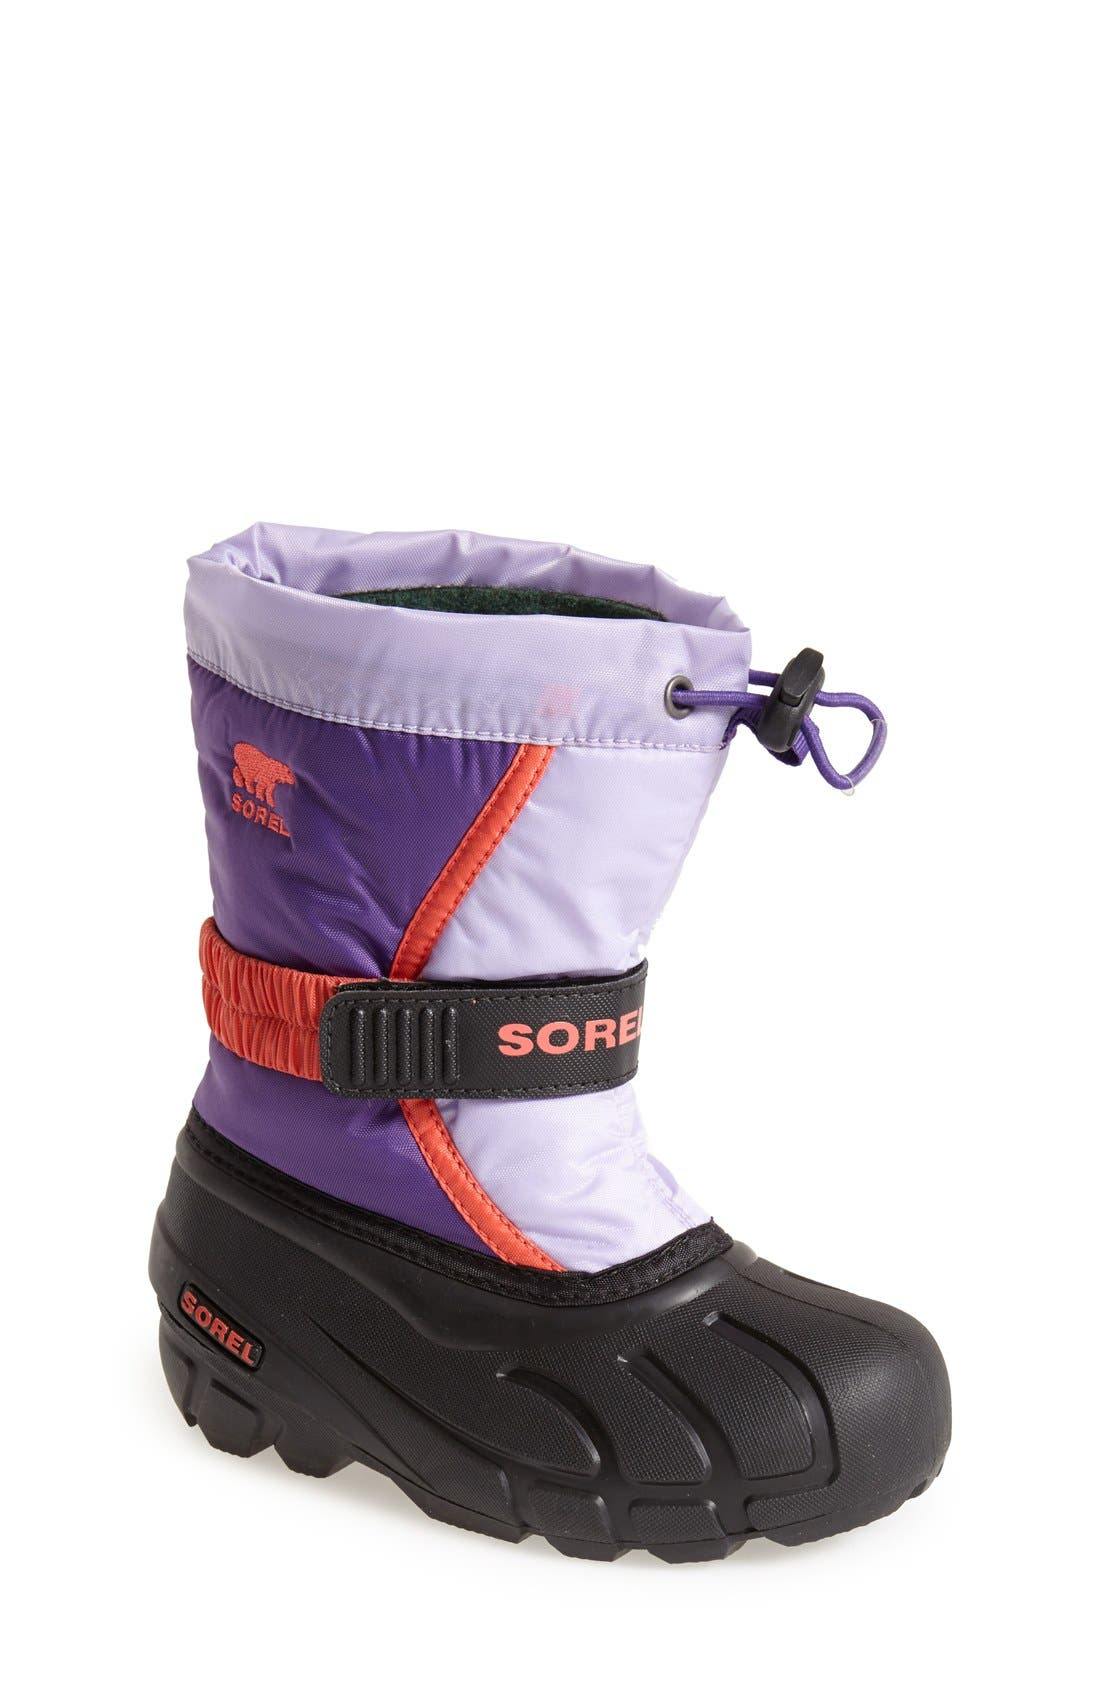 Alternate Image 1 Selected - Sorel 'Flurry' Boot (Toddler, Little Kid & Big Kid)